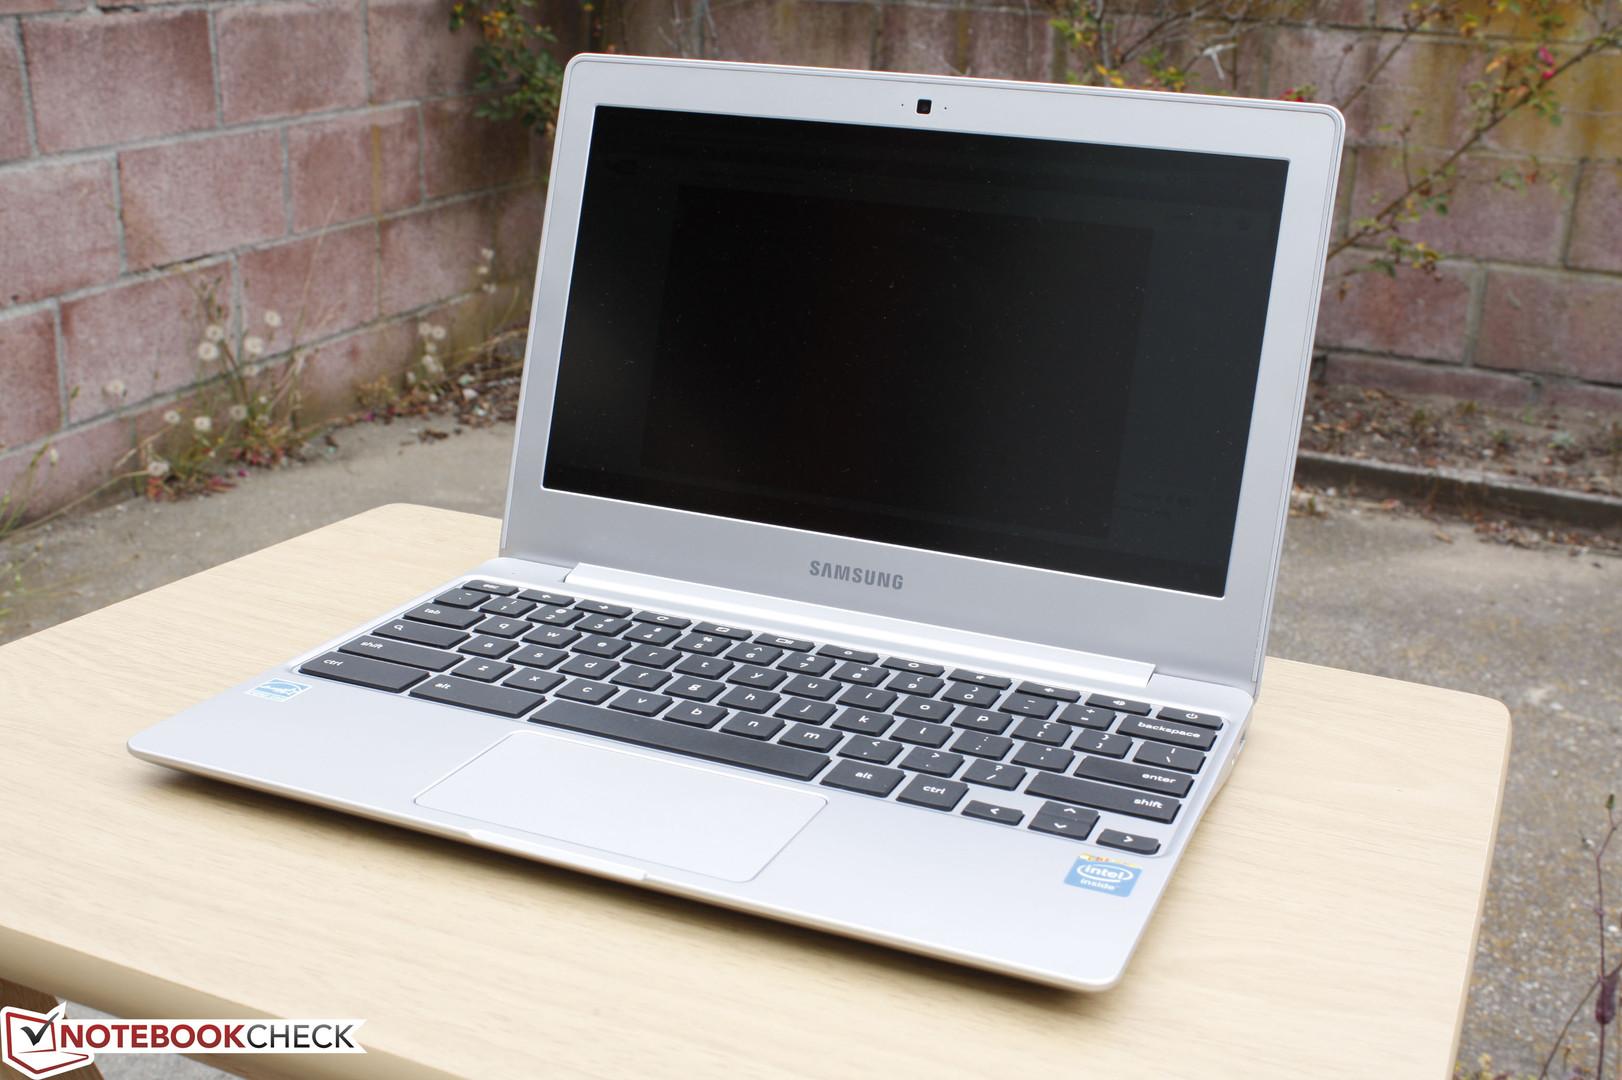 Samsung Chromebook 2 Xe500c12 Notebook Review